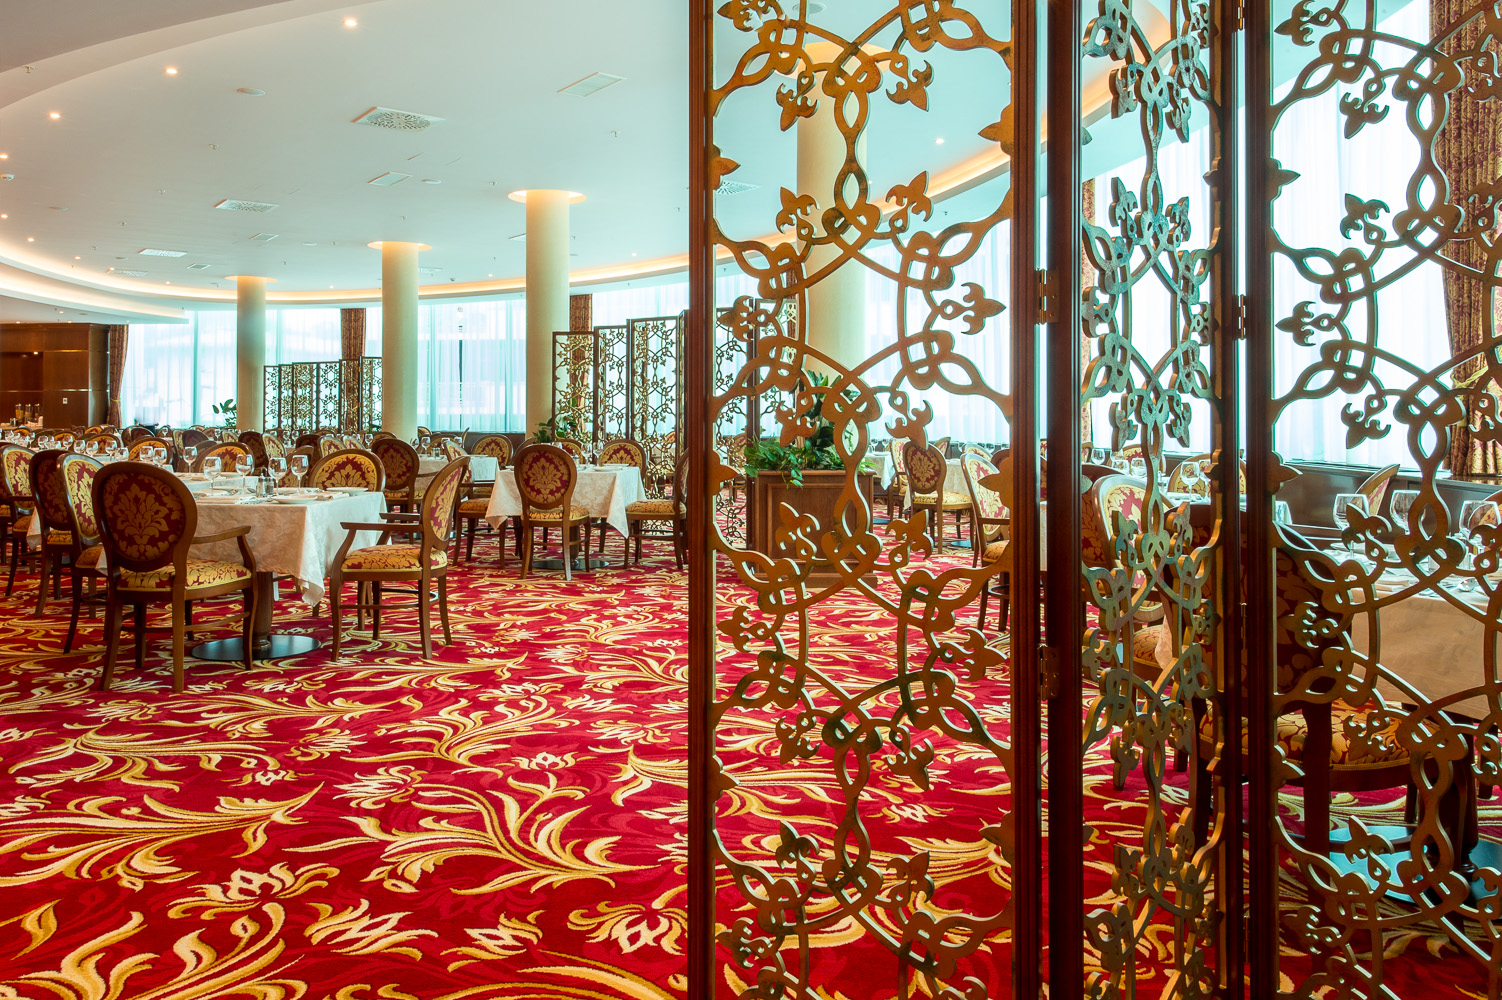 hotel-Mellain-Tuzla_oprema-javnega-dela_hotelske-sobe_oprema-hotela_hotel-furniture_lobby_restaurant_classic-furniture_06